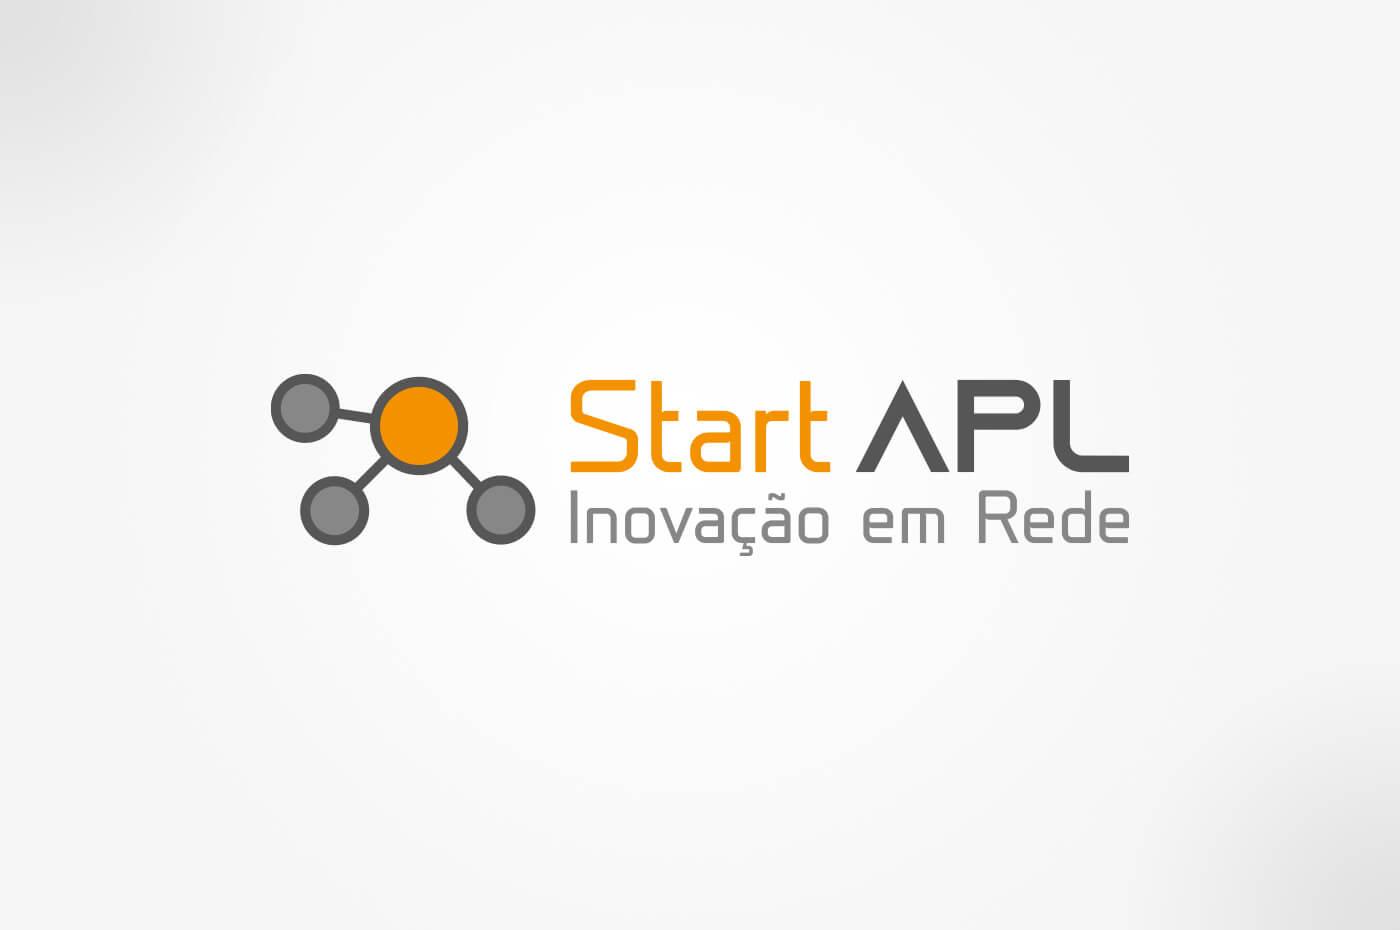 https://www.rafaeloliveira.com/portfolio/startapl